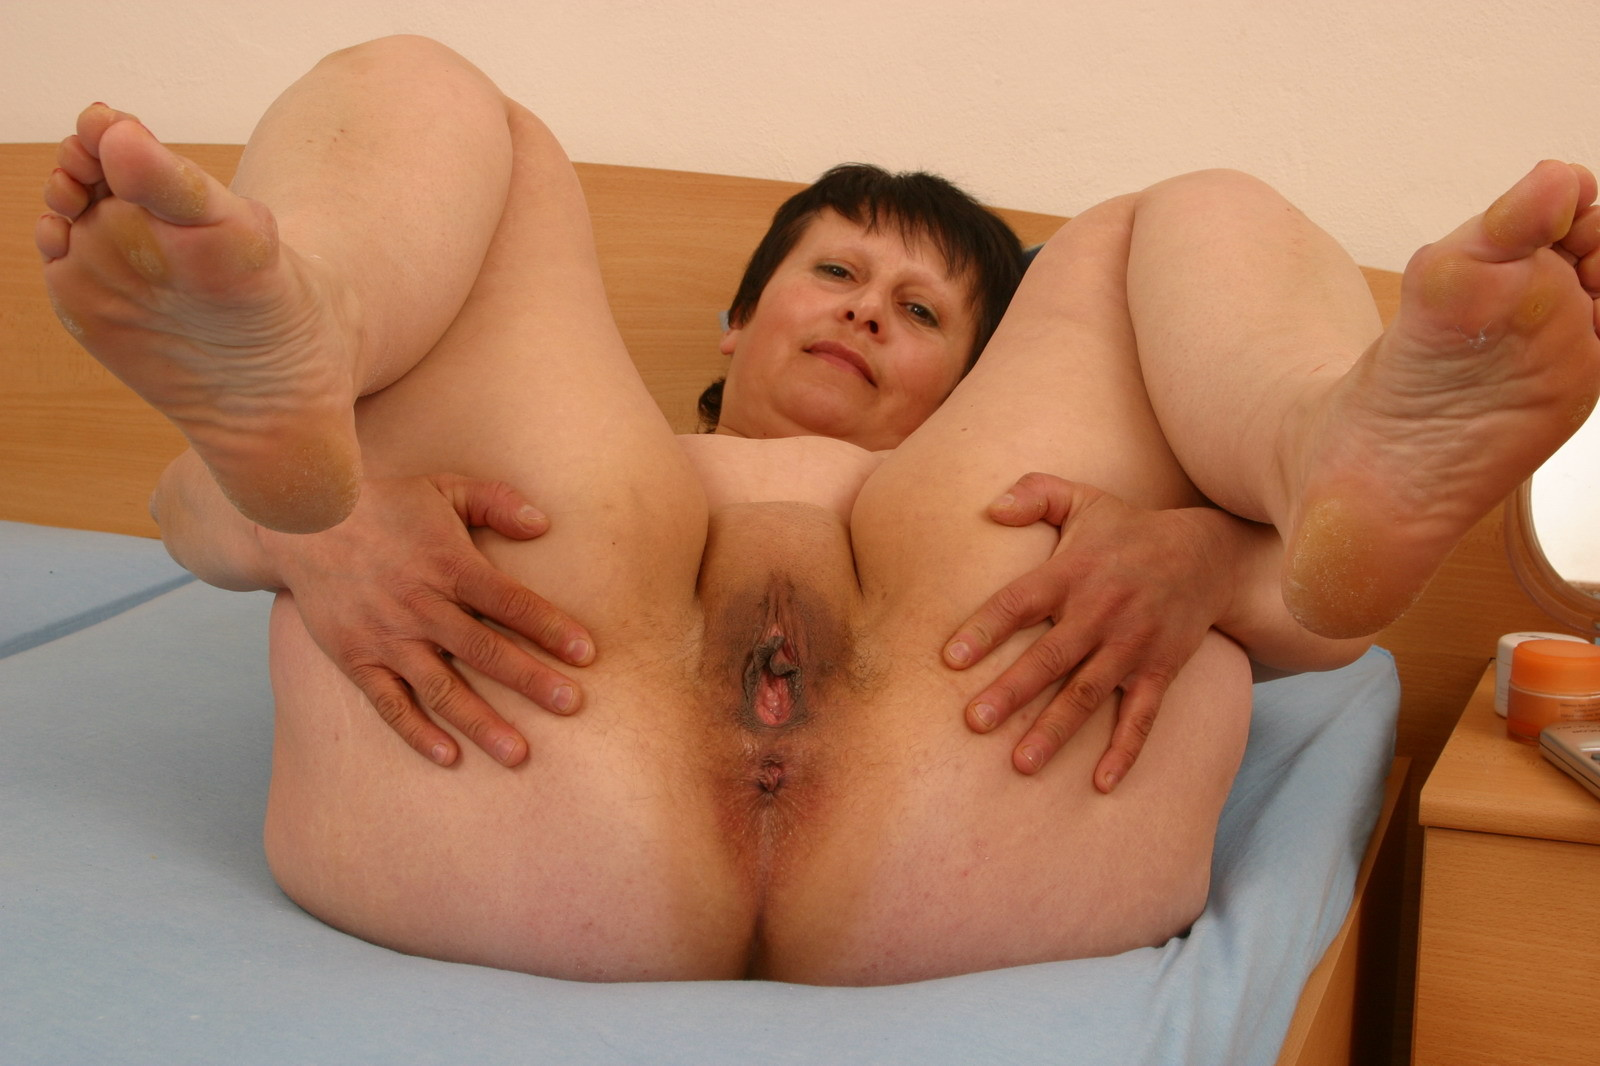 Смотреть онлайн трах с бабушками в жопу фото 521-464